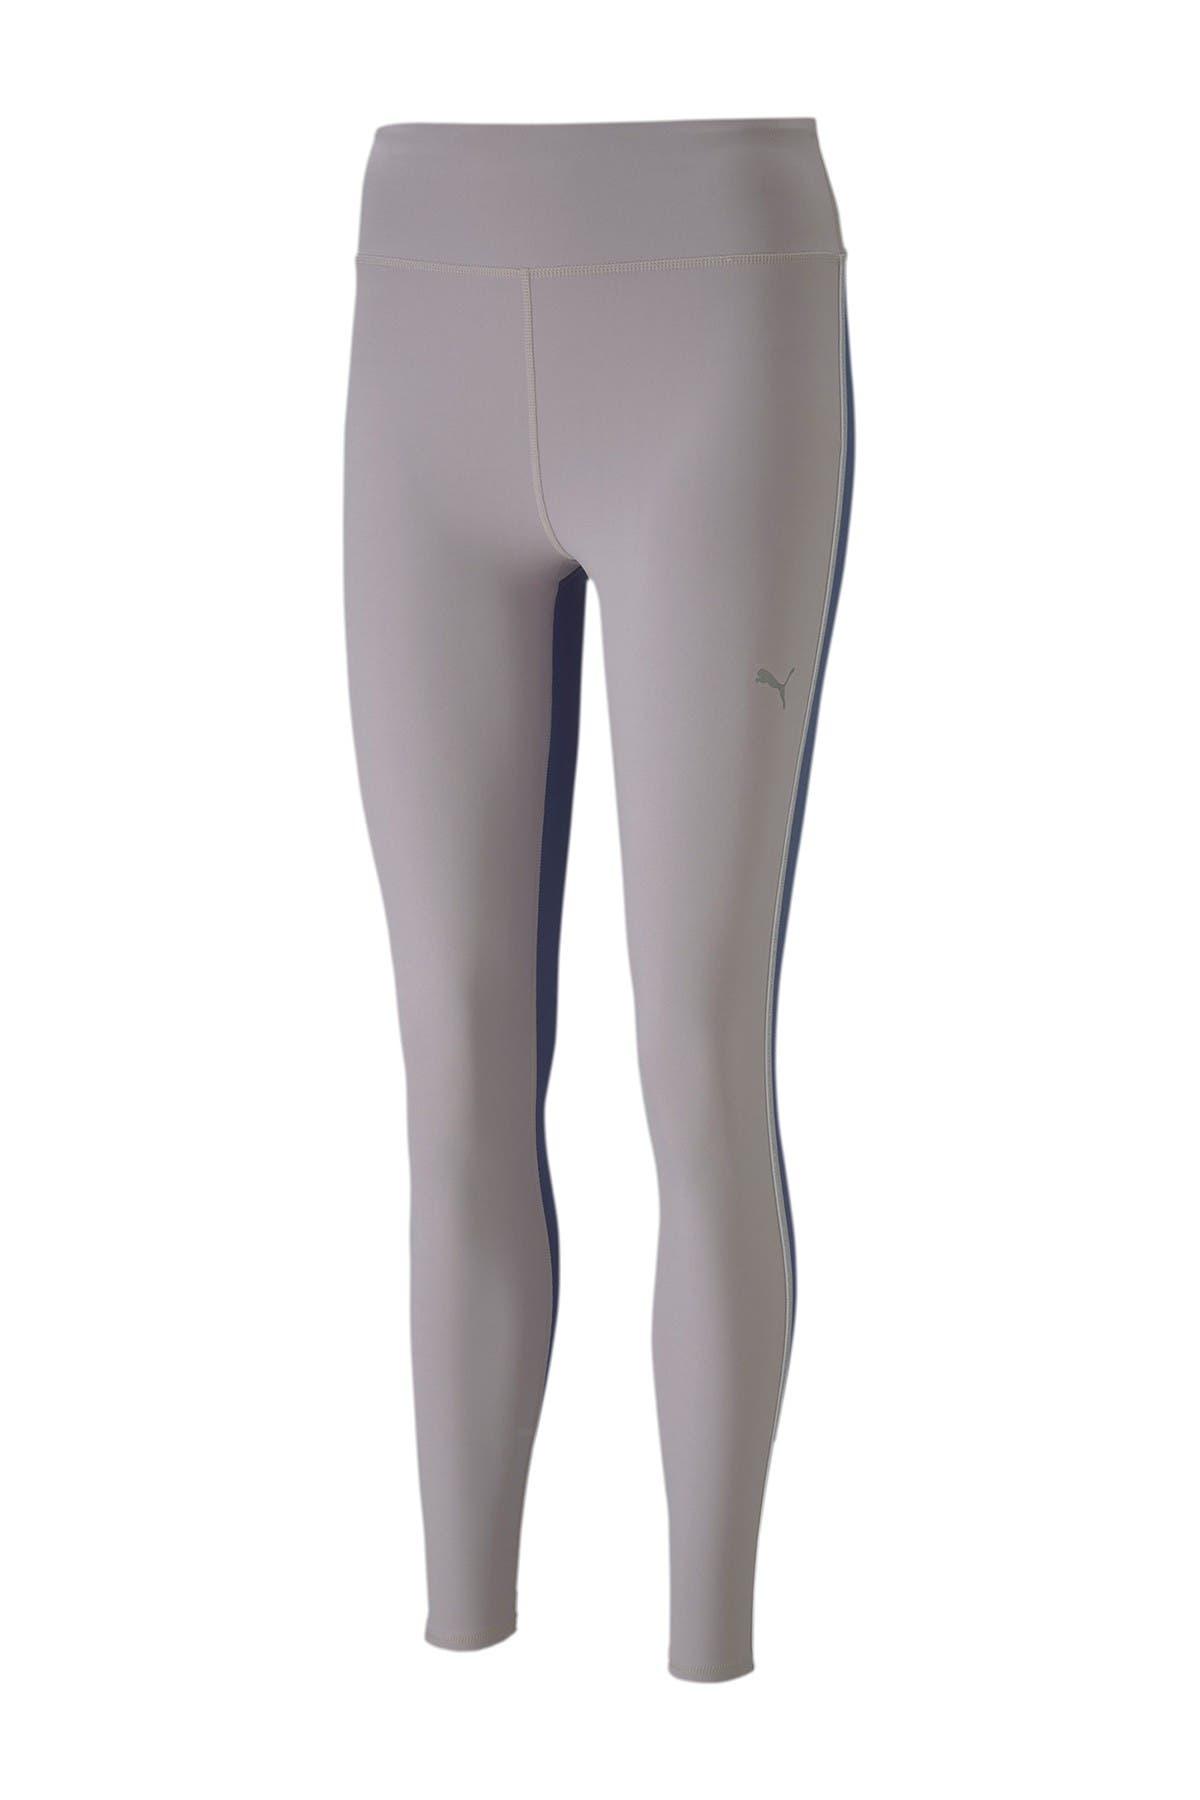 Image of PUMA Neo-Future Colorblock Leggings